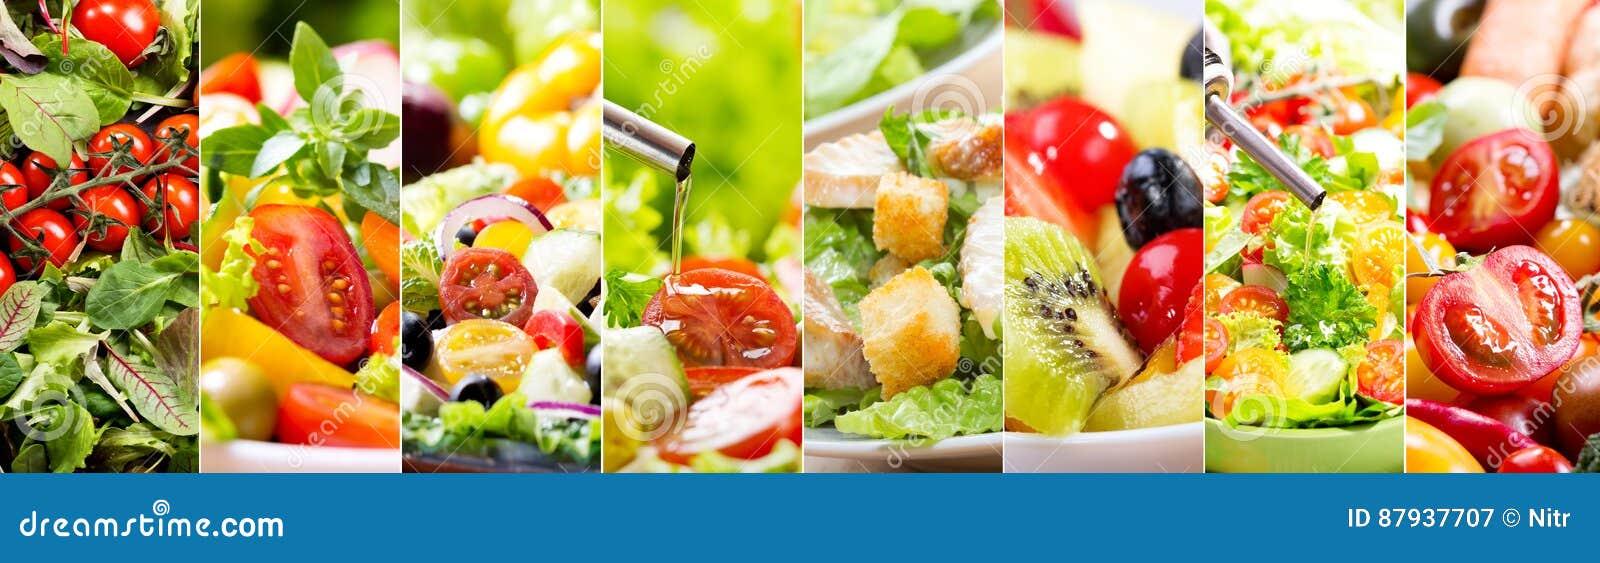 Коллаж различного салата